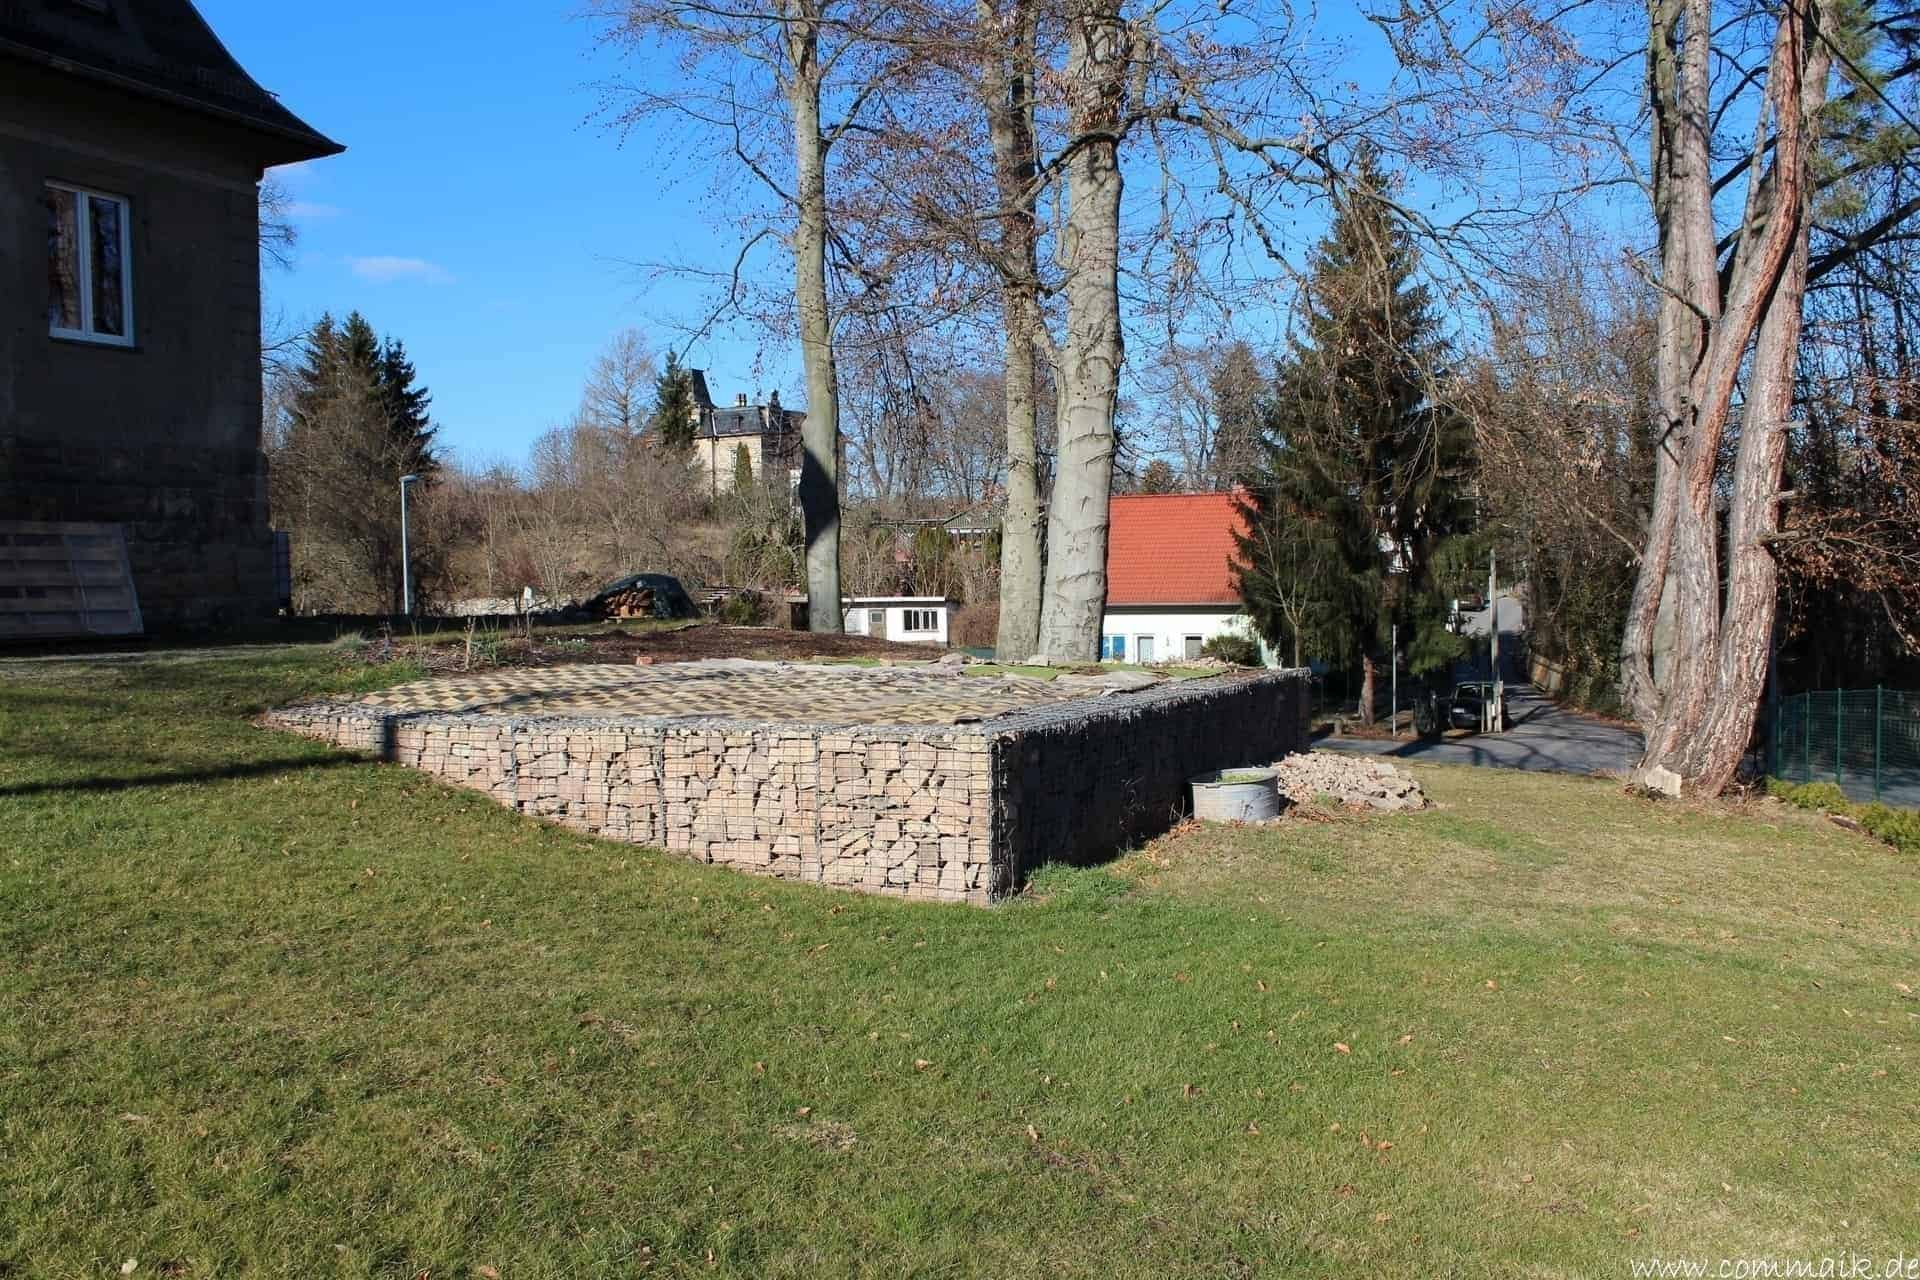 Fabulous Der Bau unserer Gabionen Terrasse zum Abfang des Hangs | commaik WB74